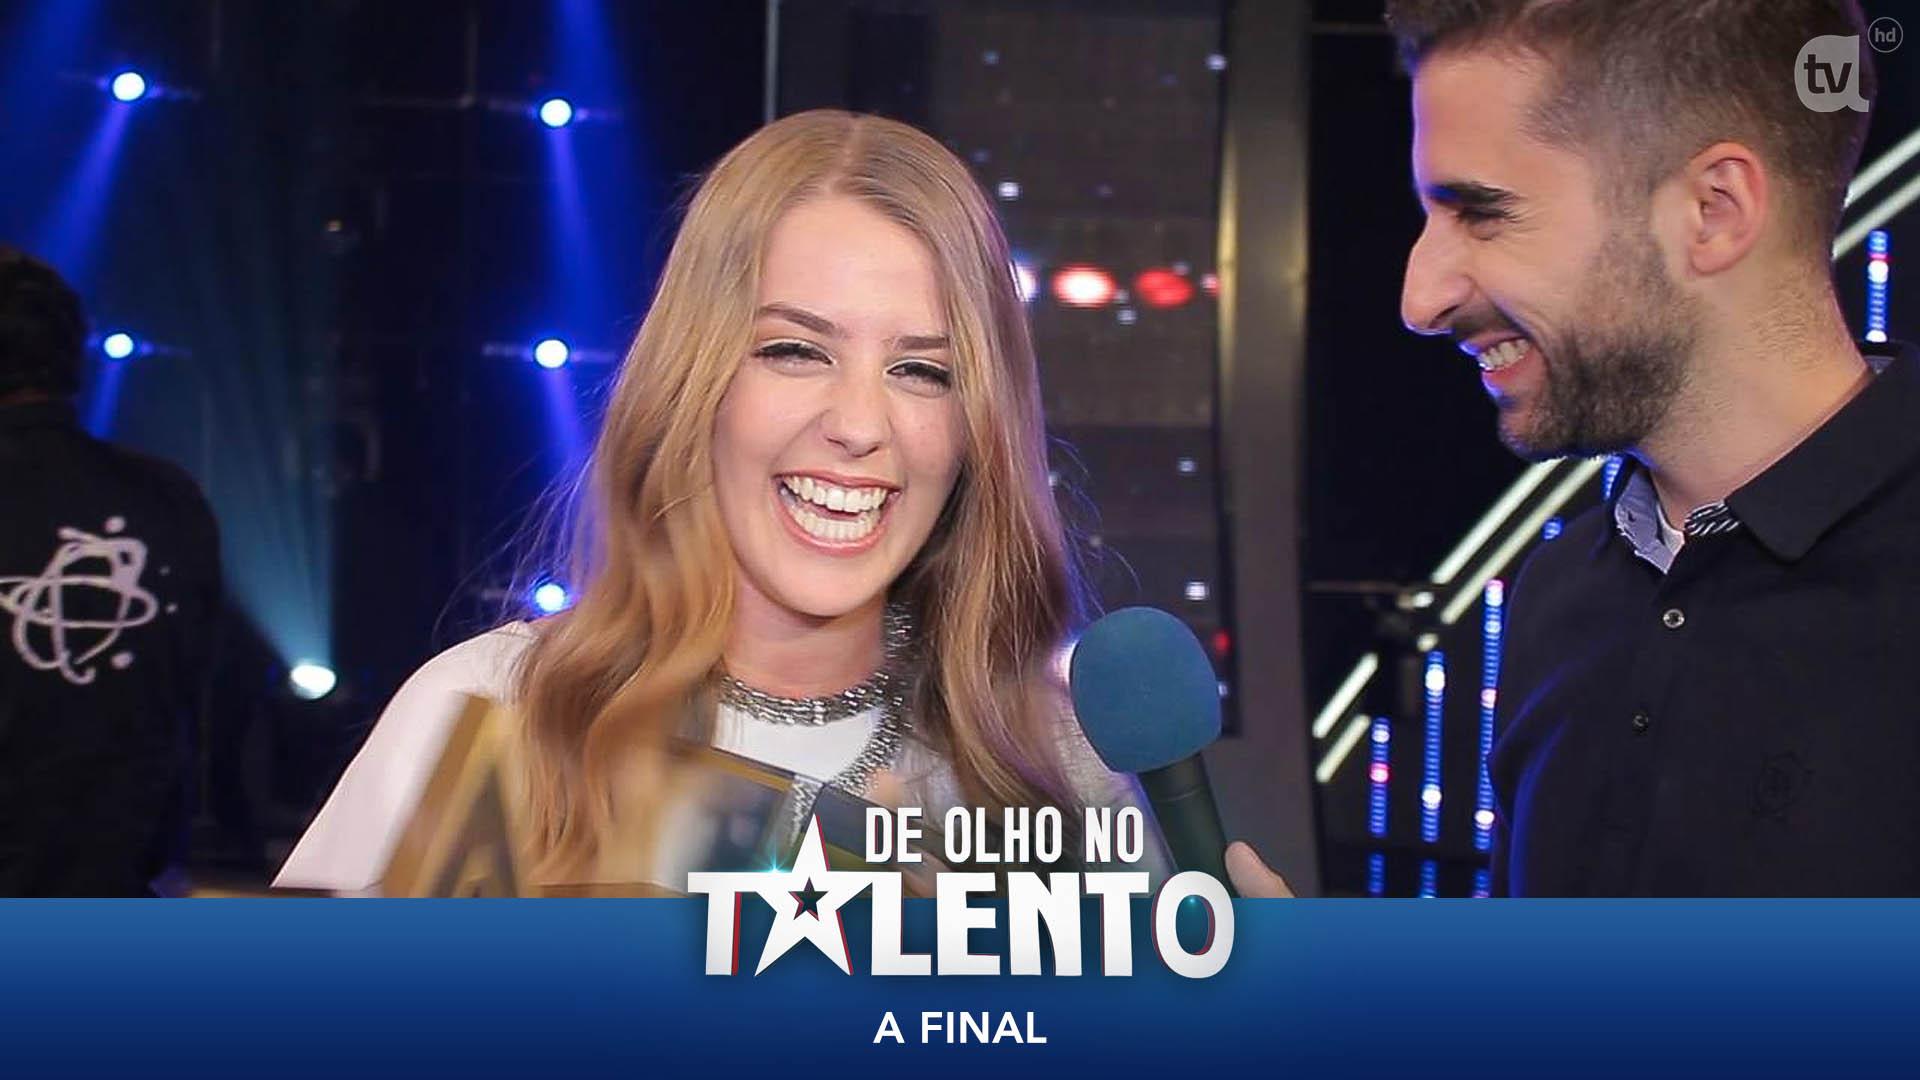 A Final De Olho No Talento - A Final